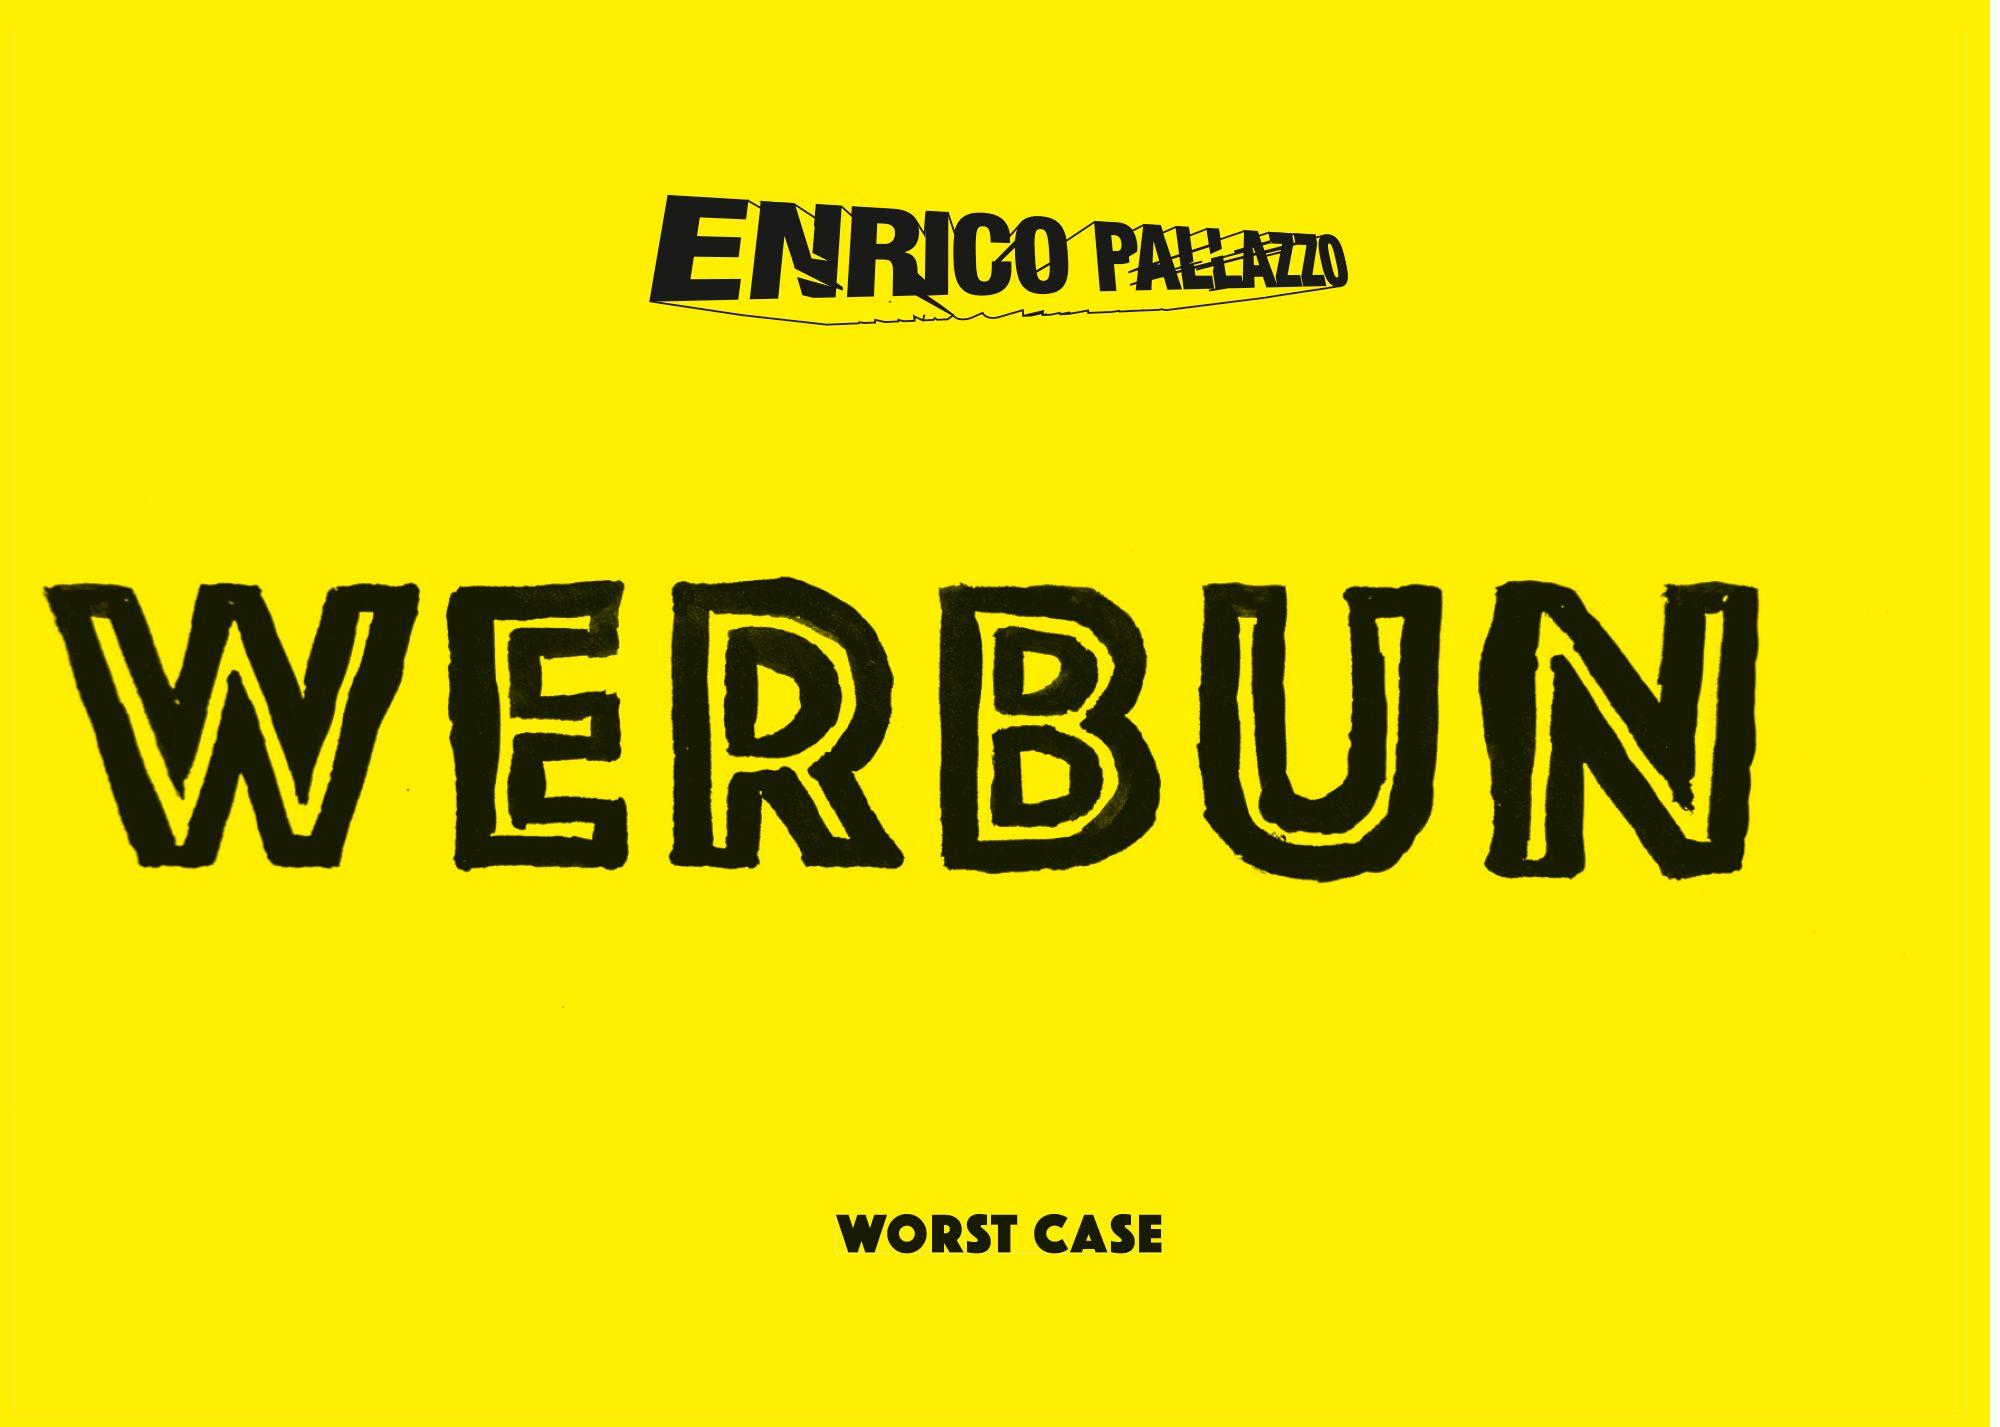 Flyer Enrico Pallazzo Worst